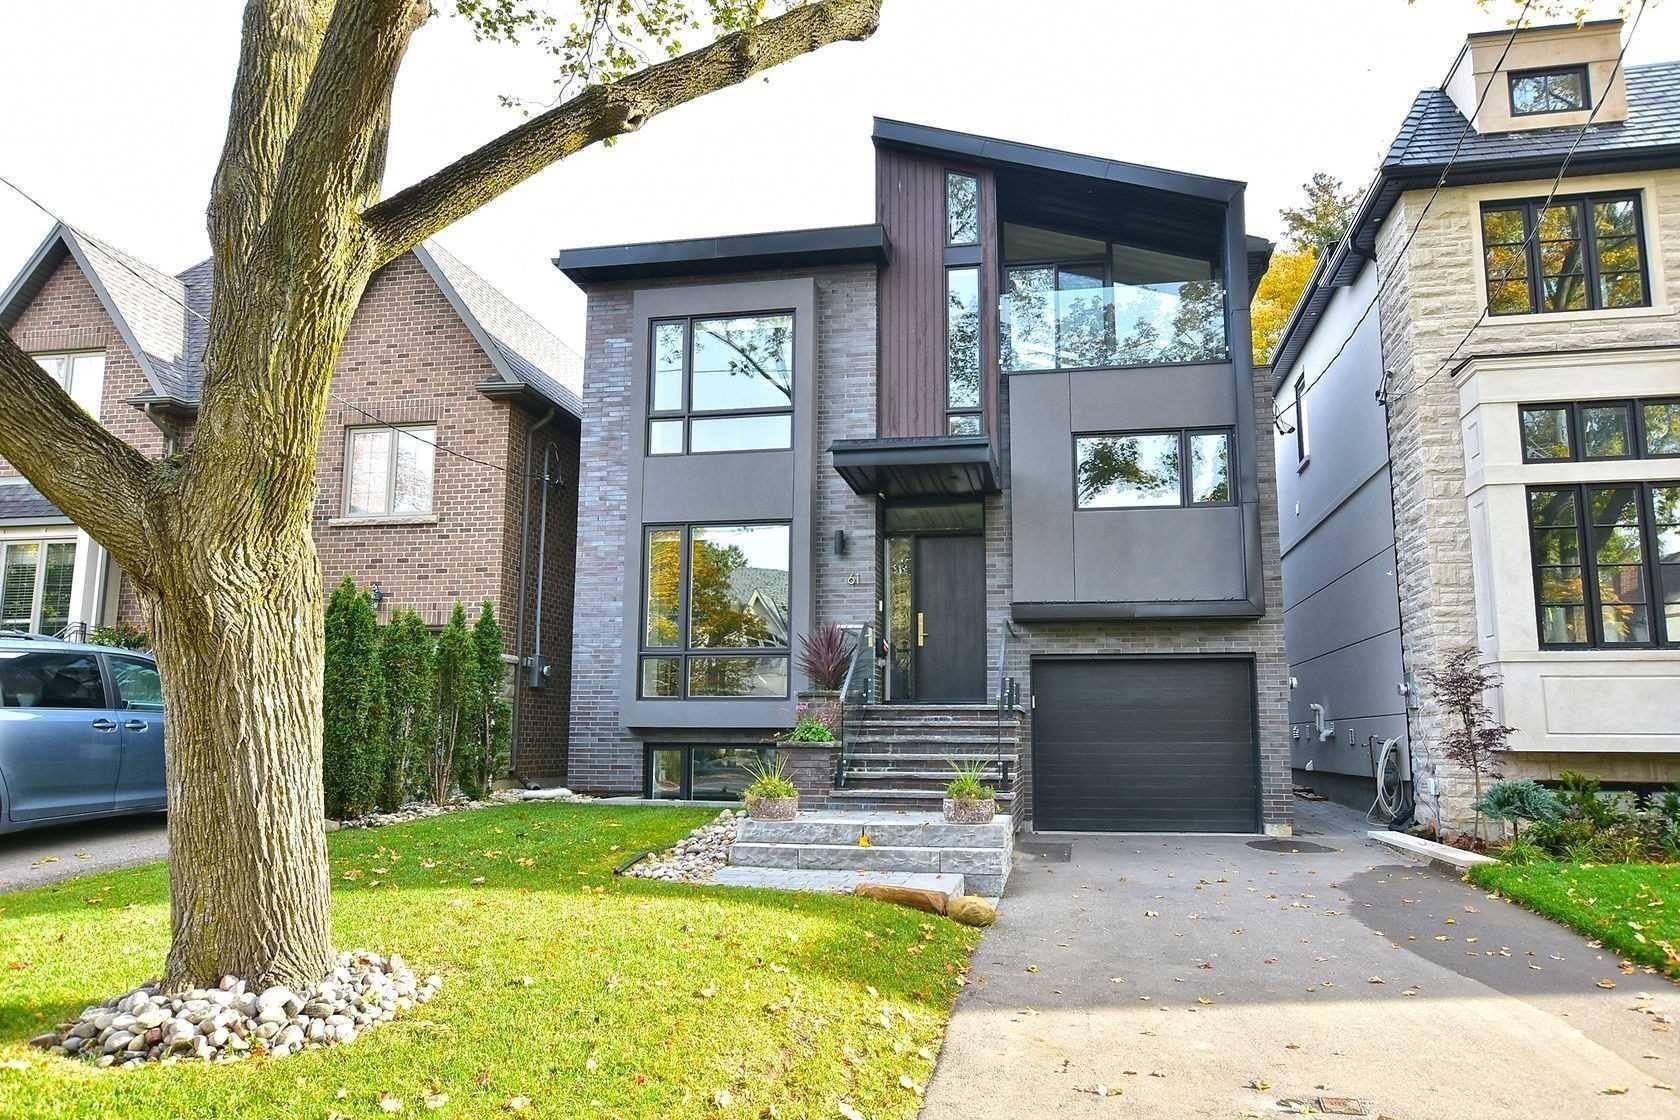 House for sale at 61 Princeton Rd Toronto Ontario - MLS: W4676610